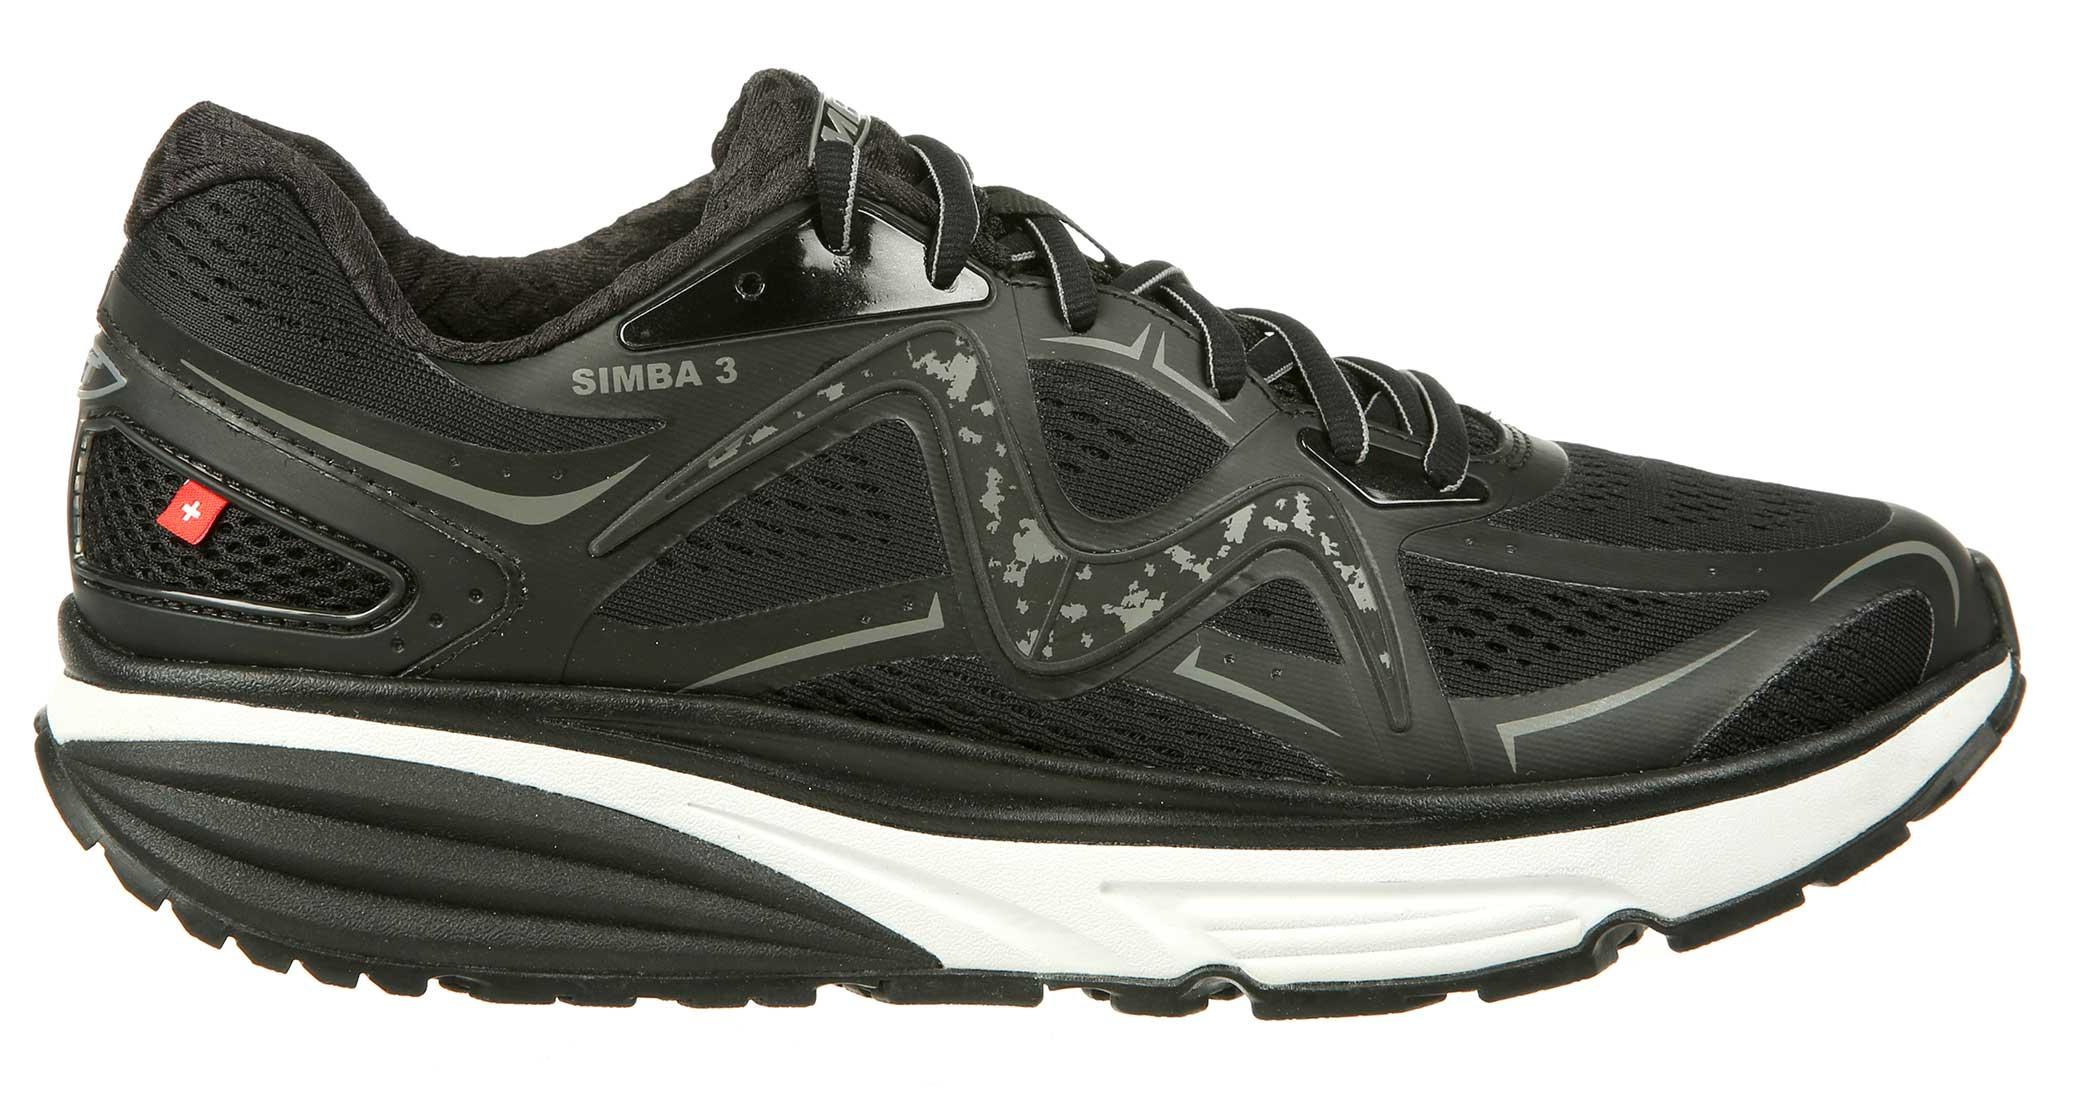 8510611a7d01 MBT Shoes Women s Simba 3 Endurance Running Shoes - 702028 ...